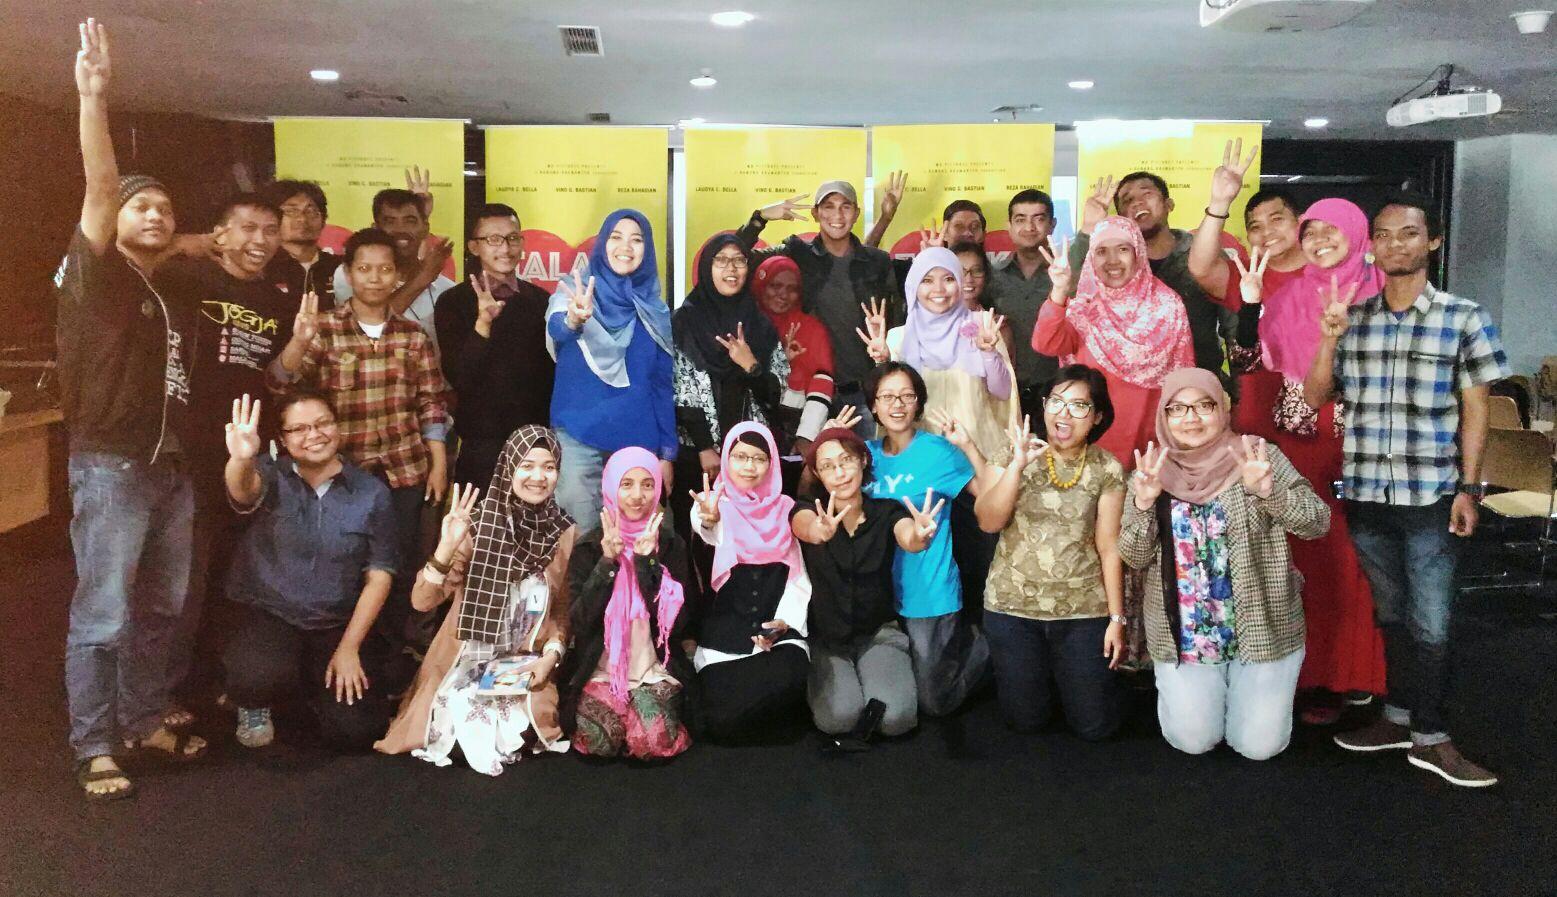 Sapa Dunia Produk Ukm Bumn Sajadah Anak Laki Acara Mini Confrence Film Talak 3 Foto Dari Wa Group Kopi